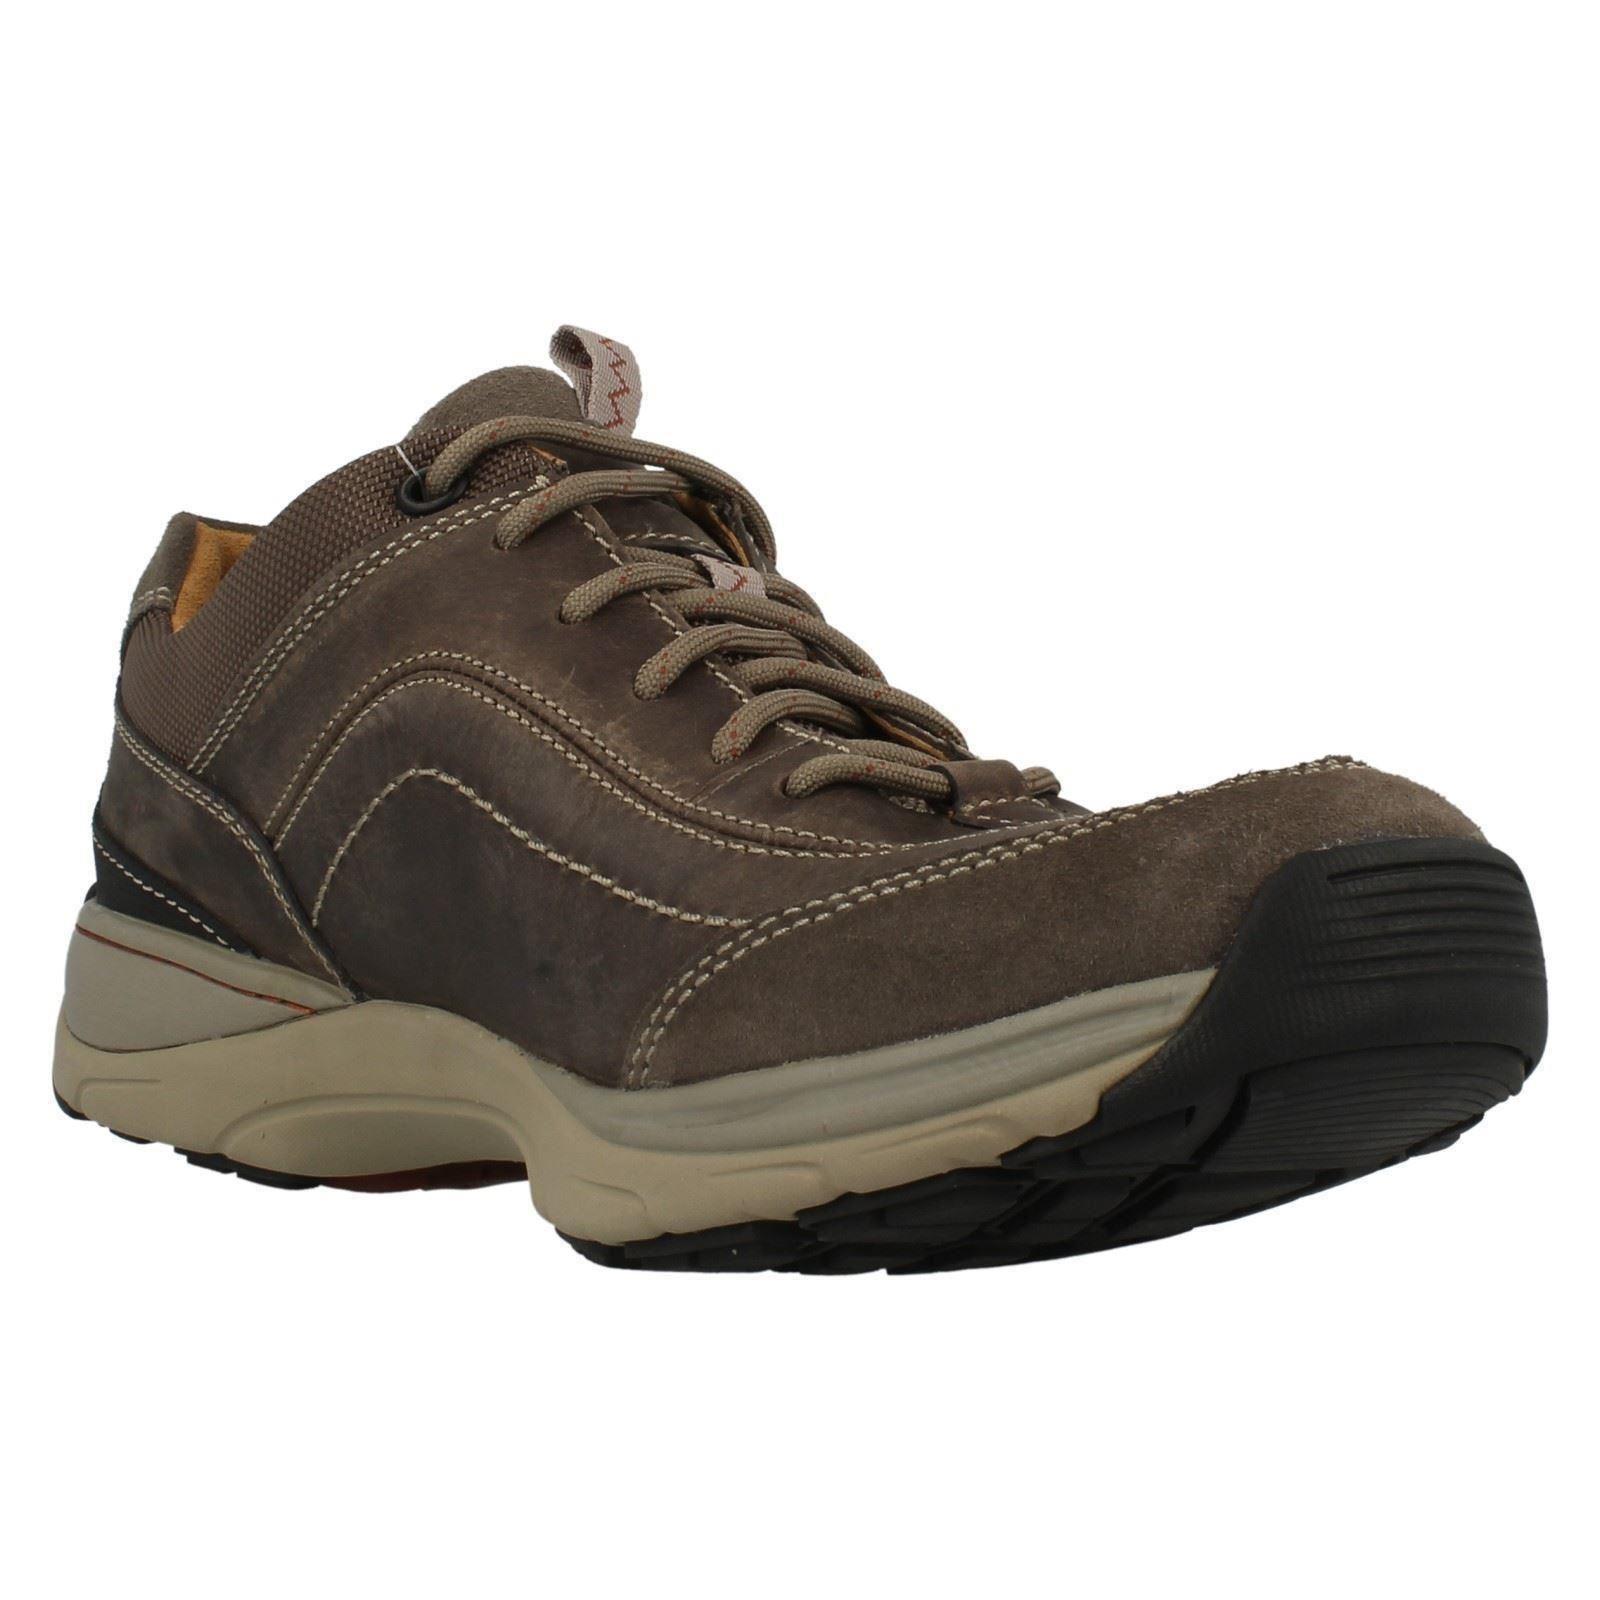 Mens Clarks Casual Active Air Vent Shoes Skyward Vibe Ebay